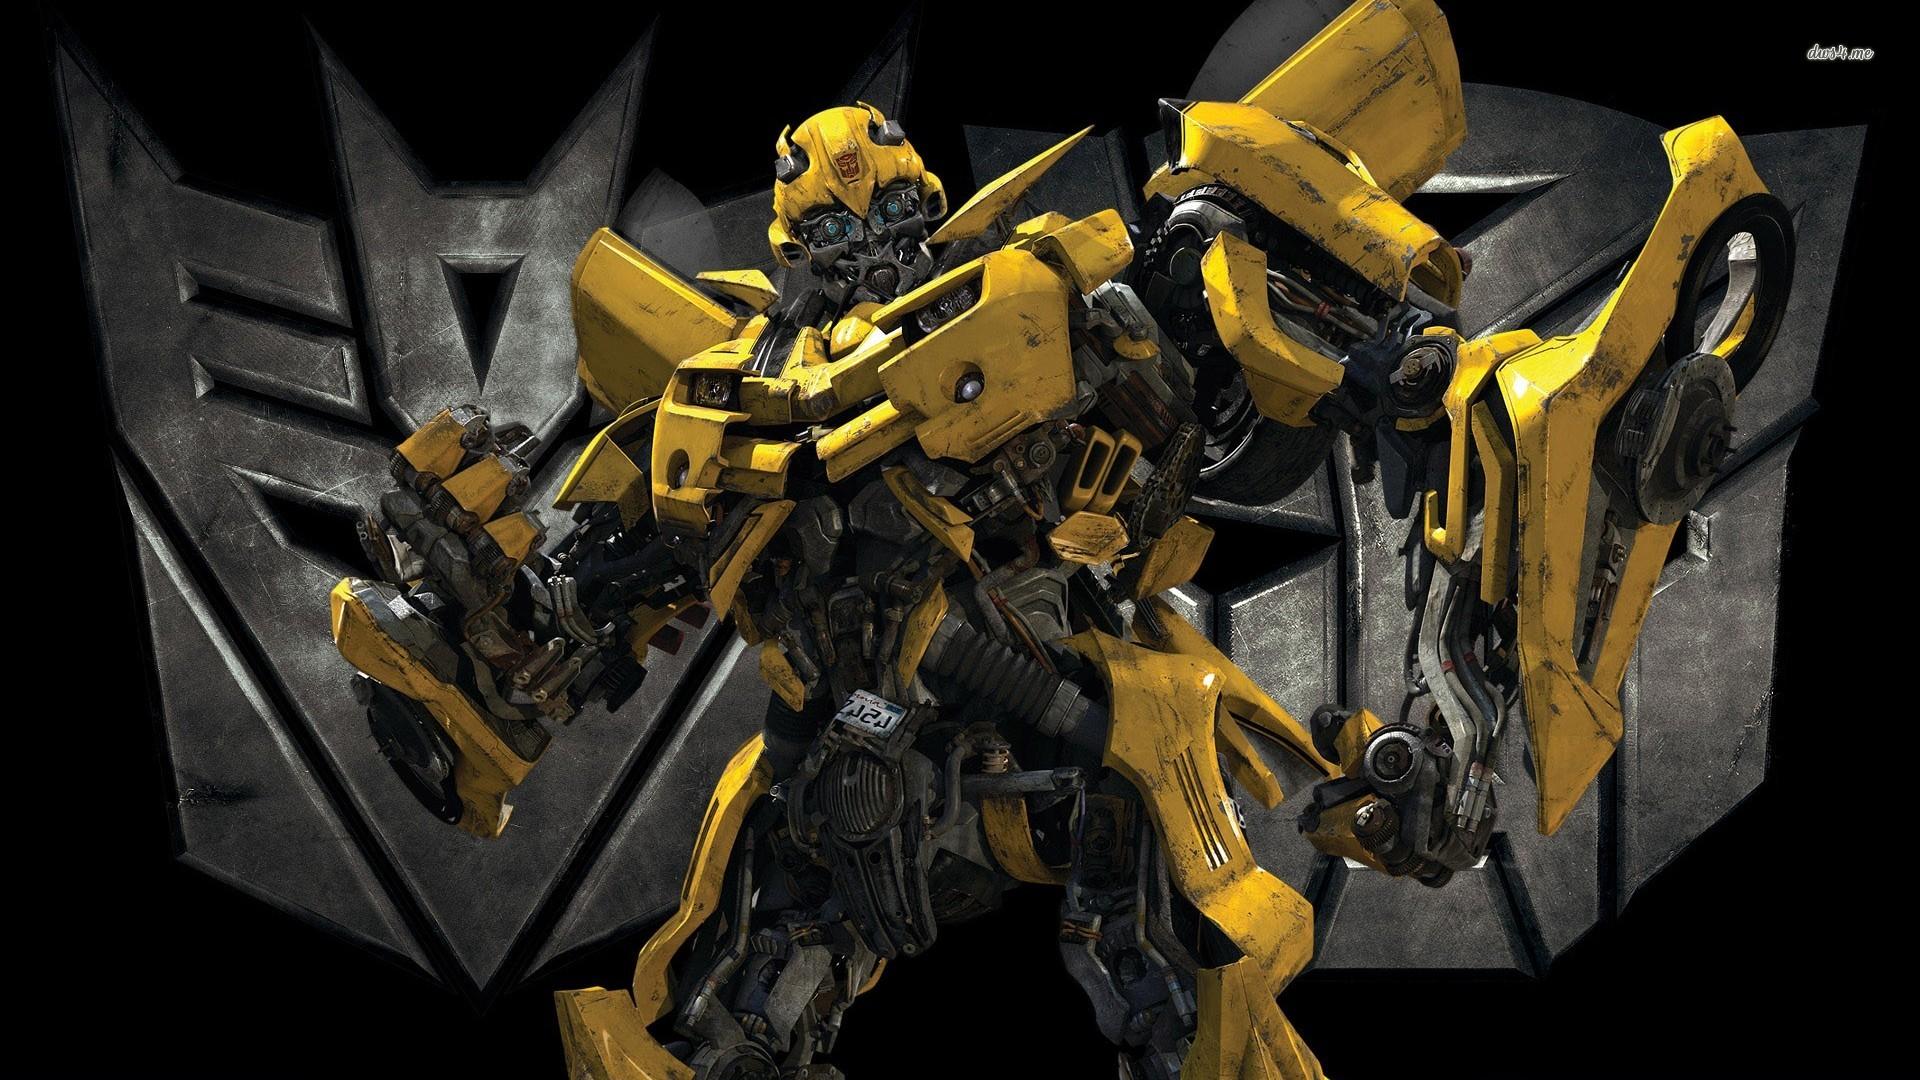 Bumblebee Transformers wallpapers HD   281237 1920x1080